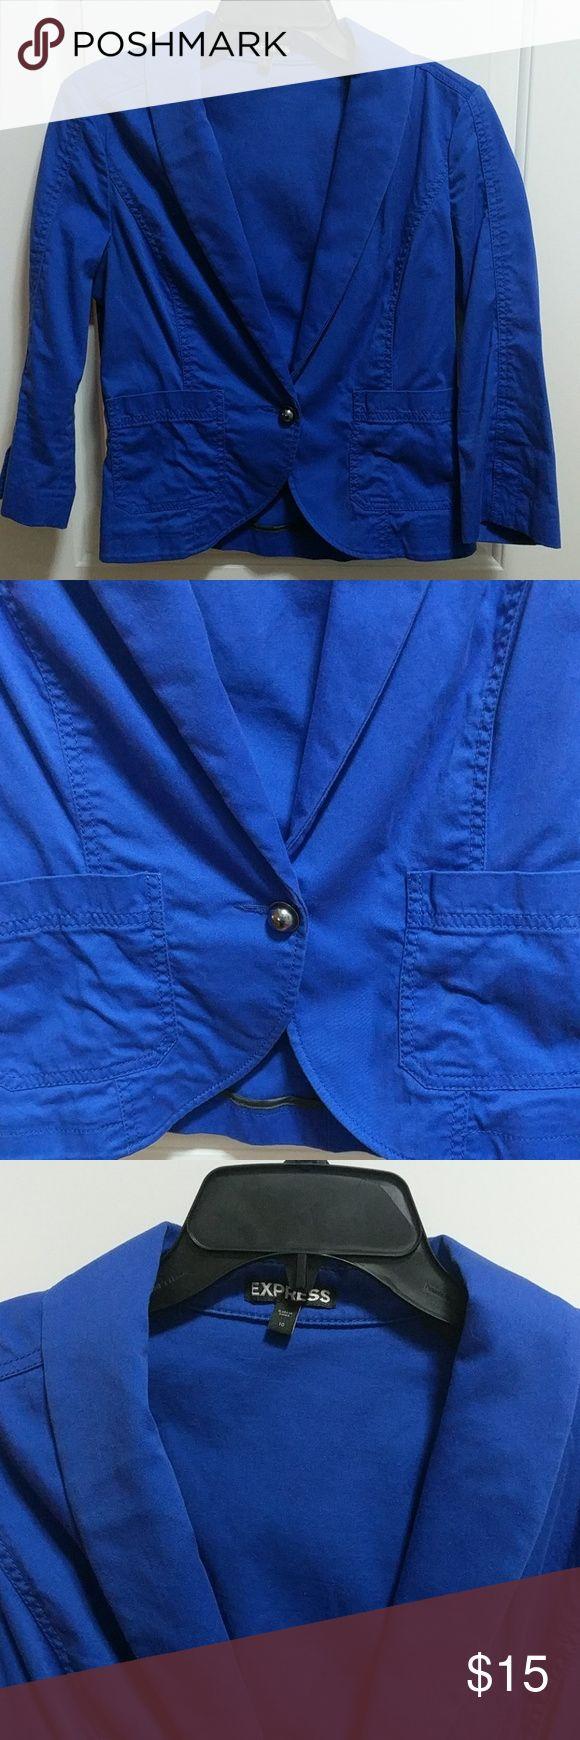 Express Women's Blue Jacket size 10 Express royal blue women's jacket. Single button closure, 2 front pockets. Slits on sleeves.  🌟Smoke free home 🌟No trades 🌟11301 Express Jackets & Coats Blazers